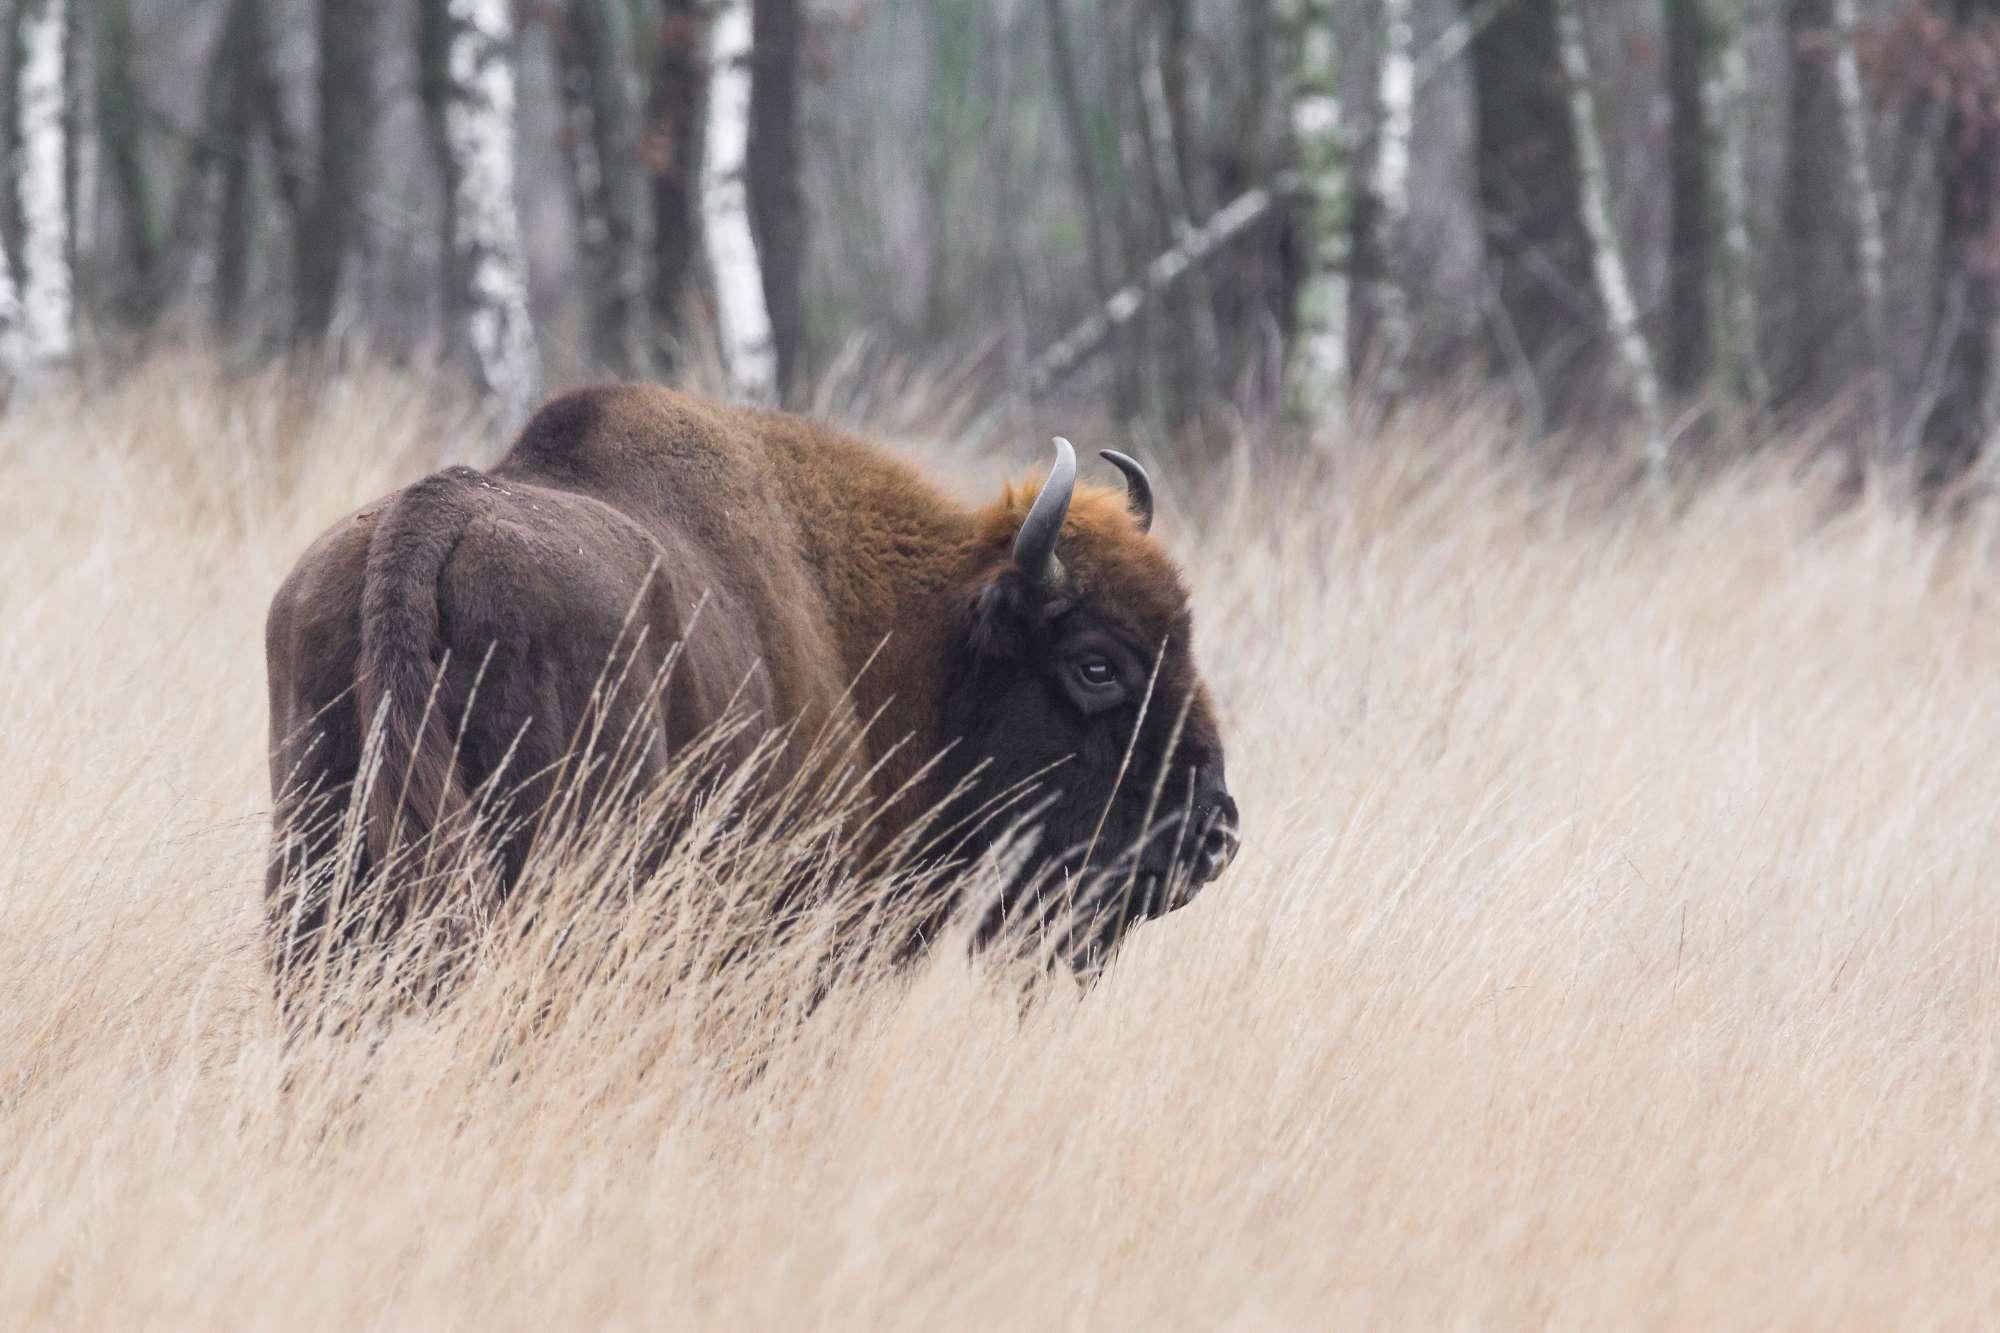 Young Rewilders Community